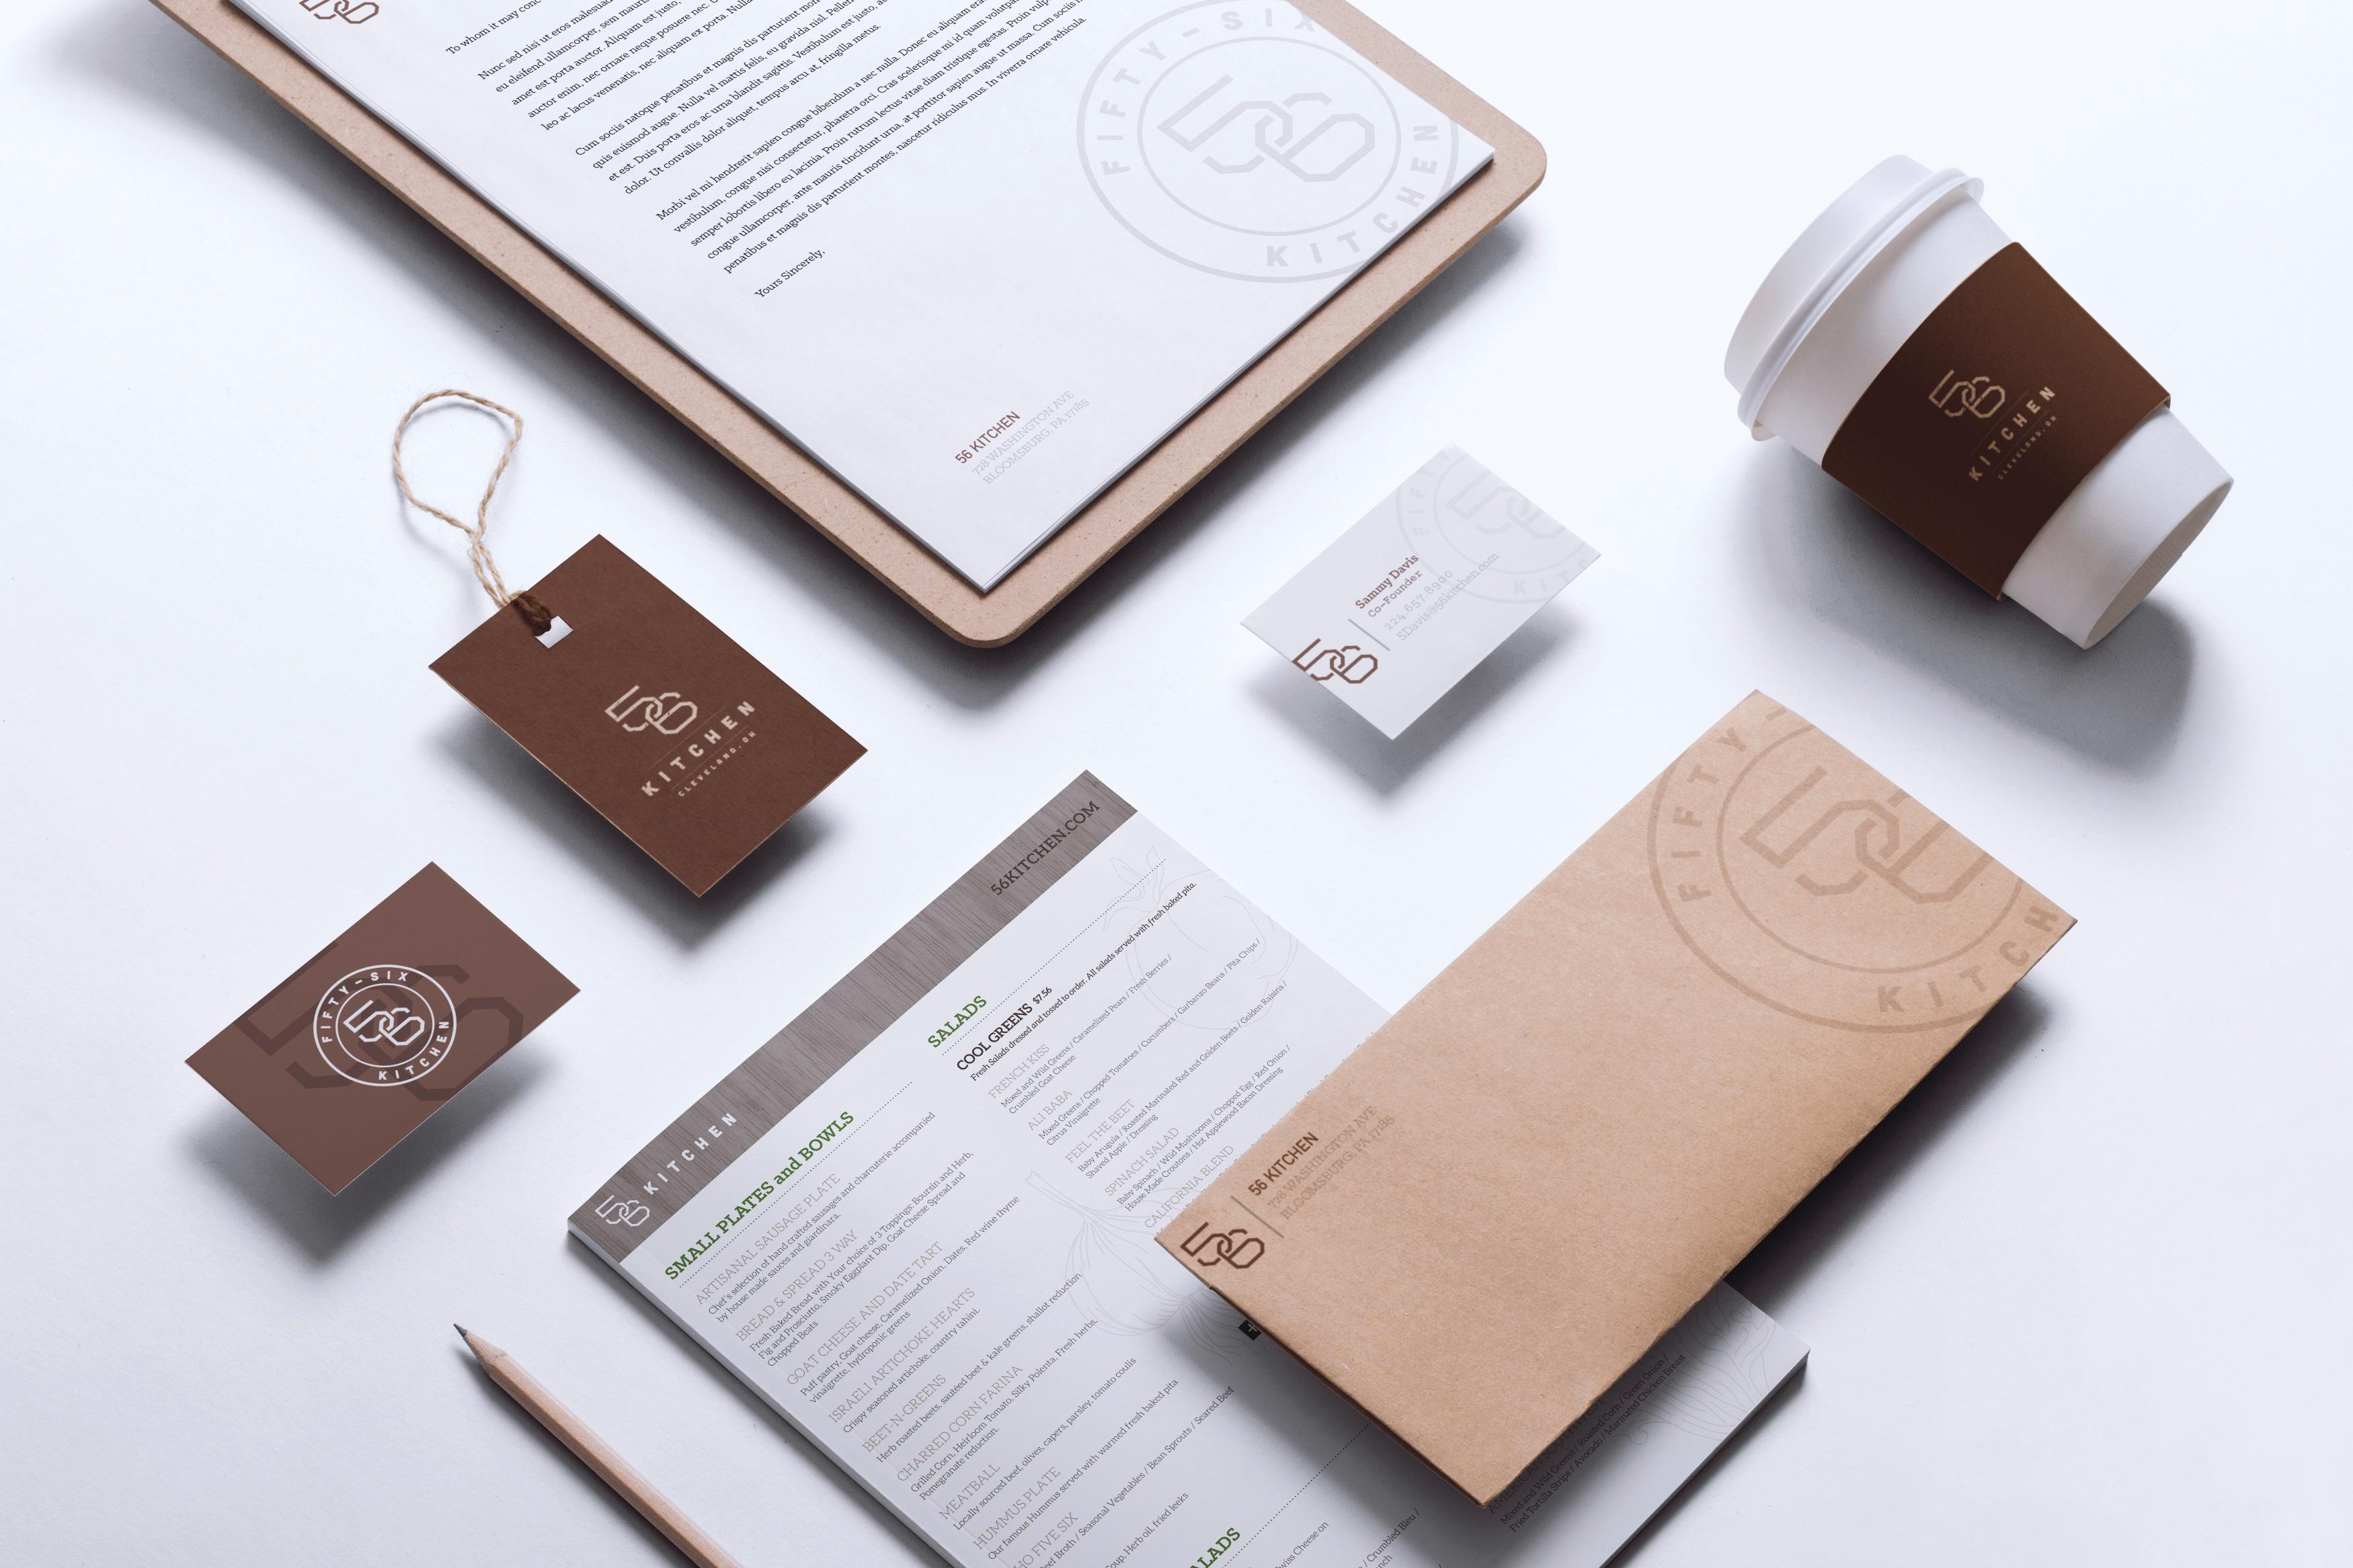 branded stationery set